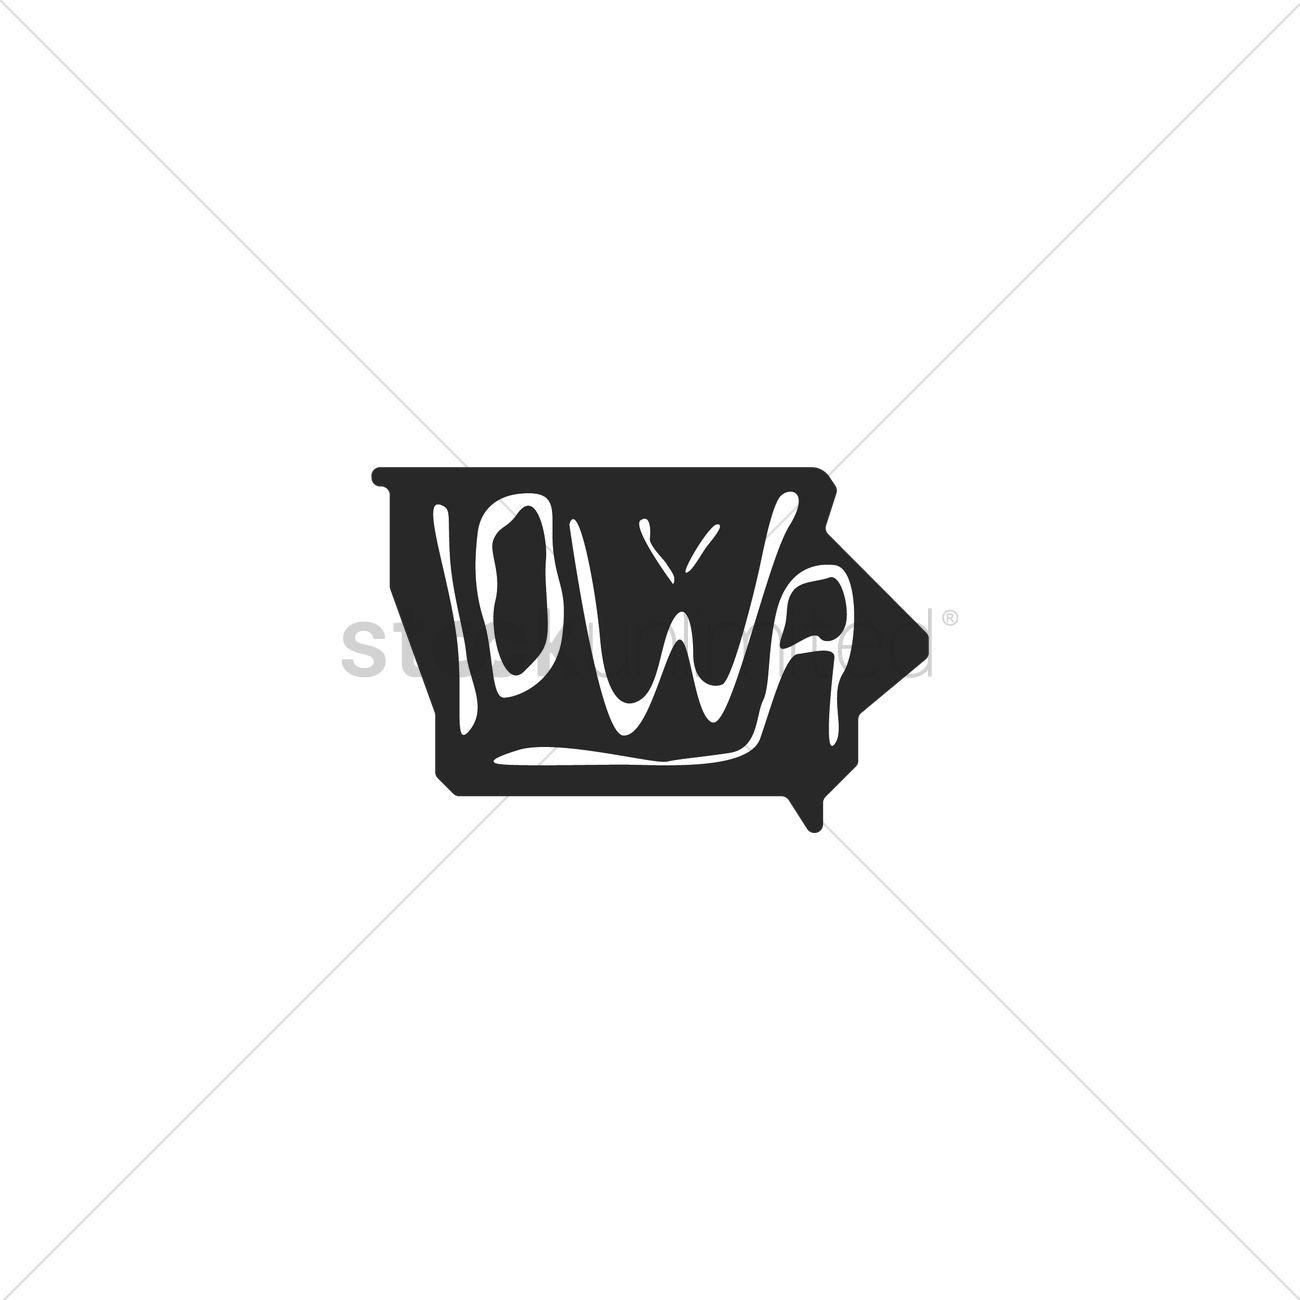 iowa state map ベクタークリップアート 1557119 stockunlimited